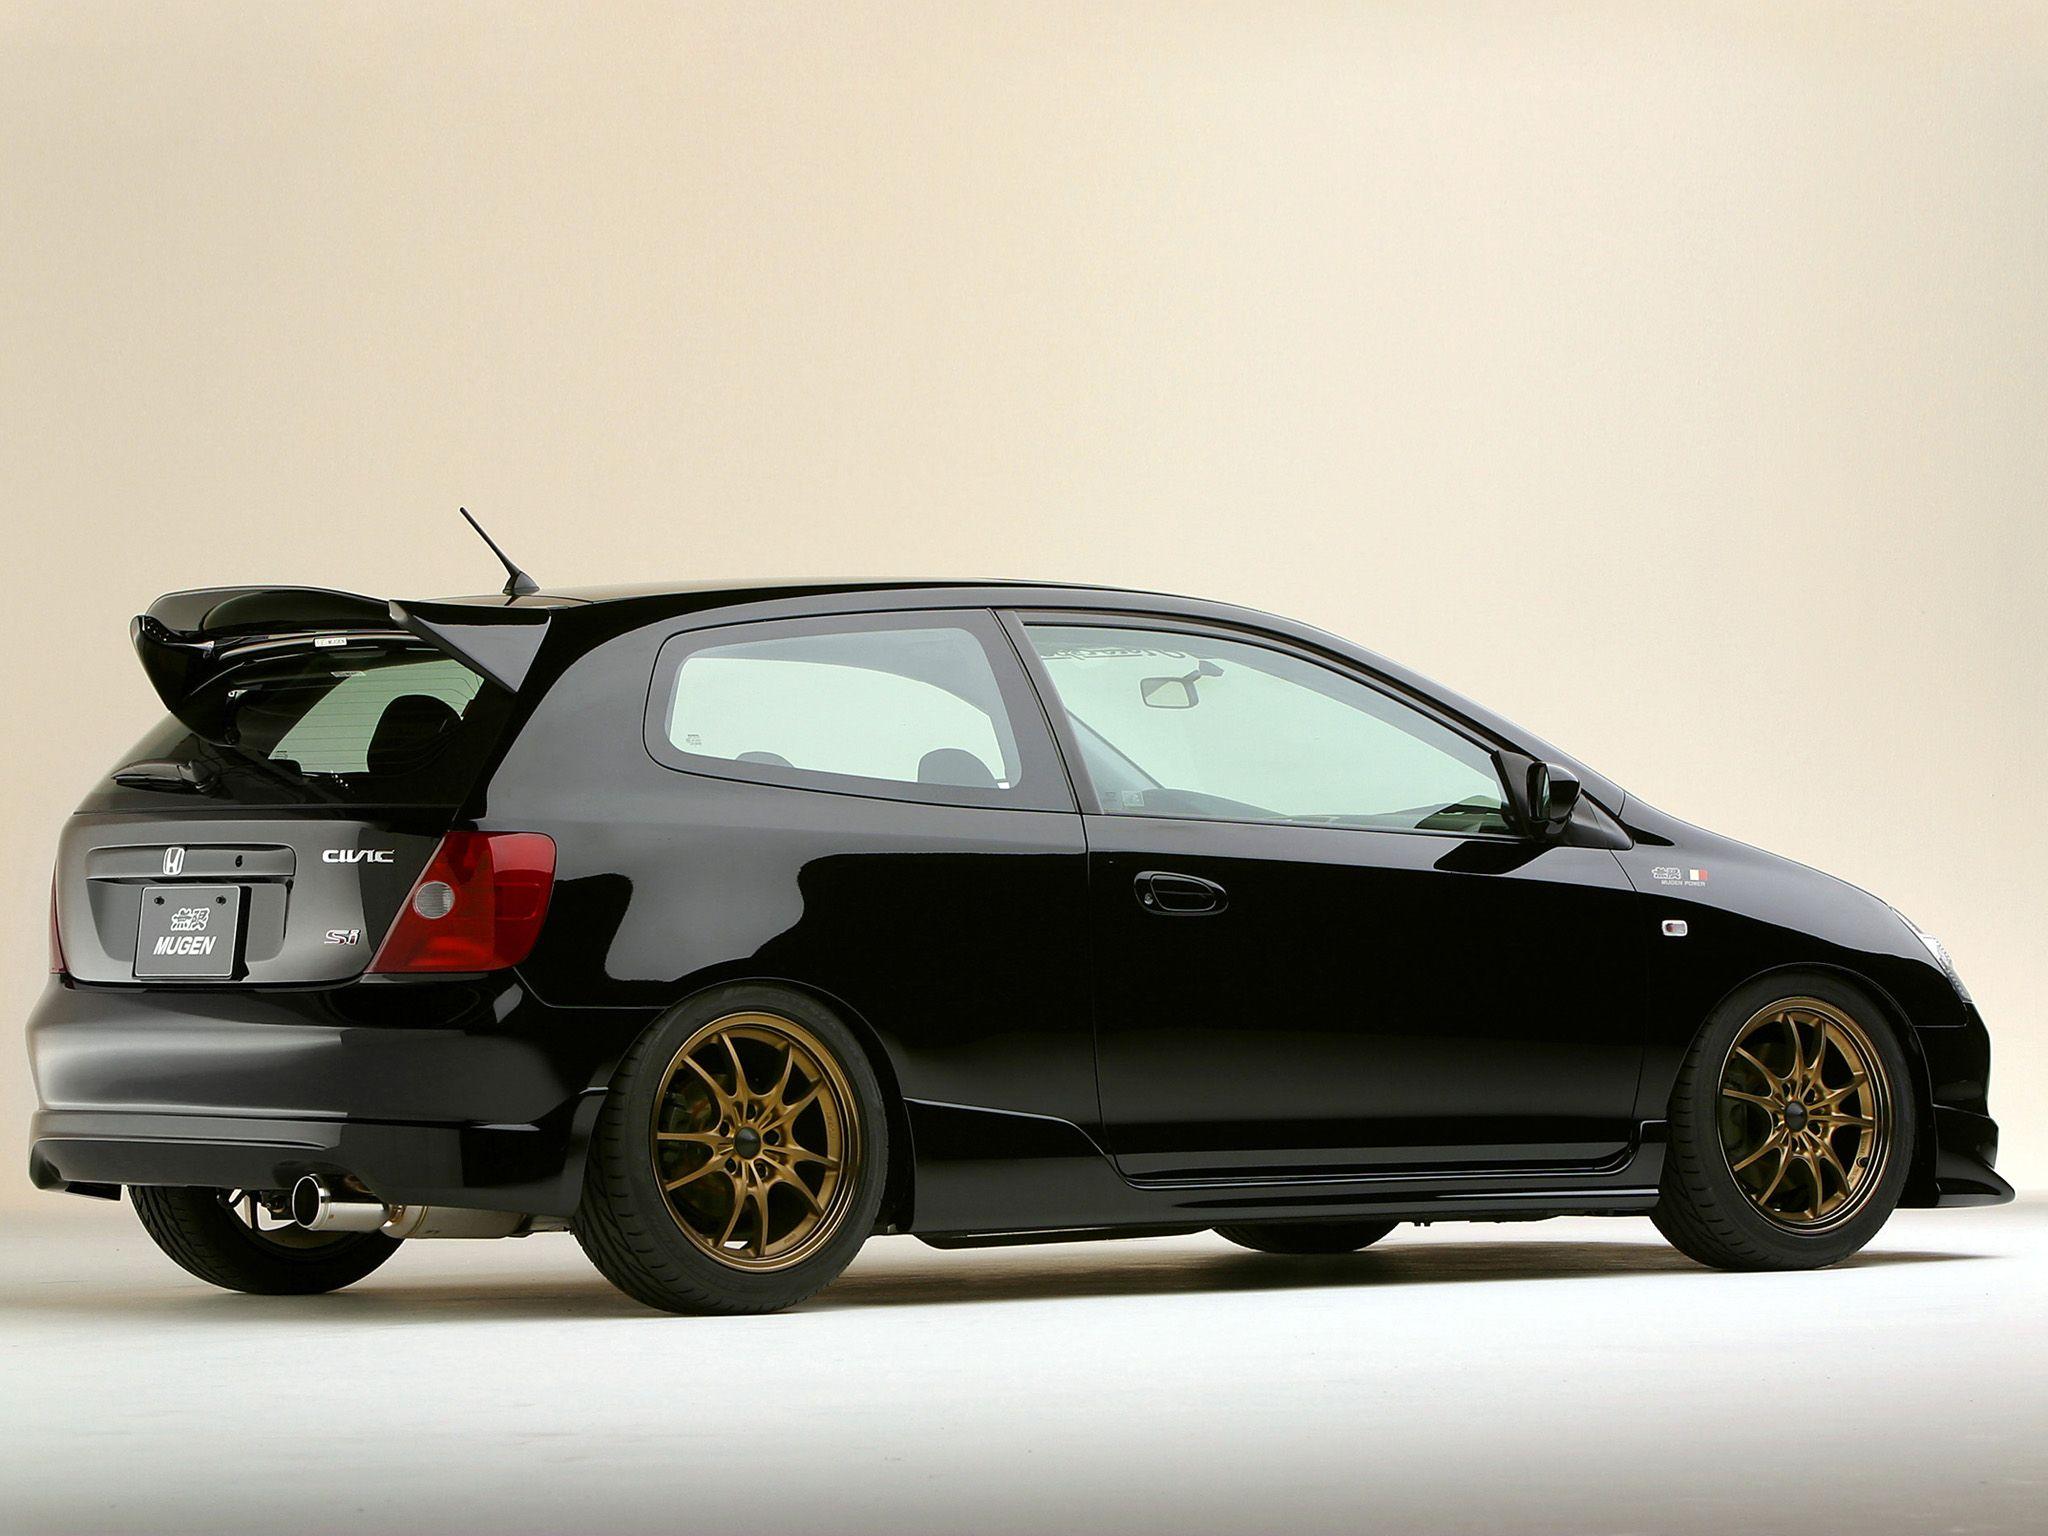 2003 Honda Civic Si - Powered by Mugen | Cars | Honda civic